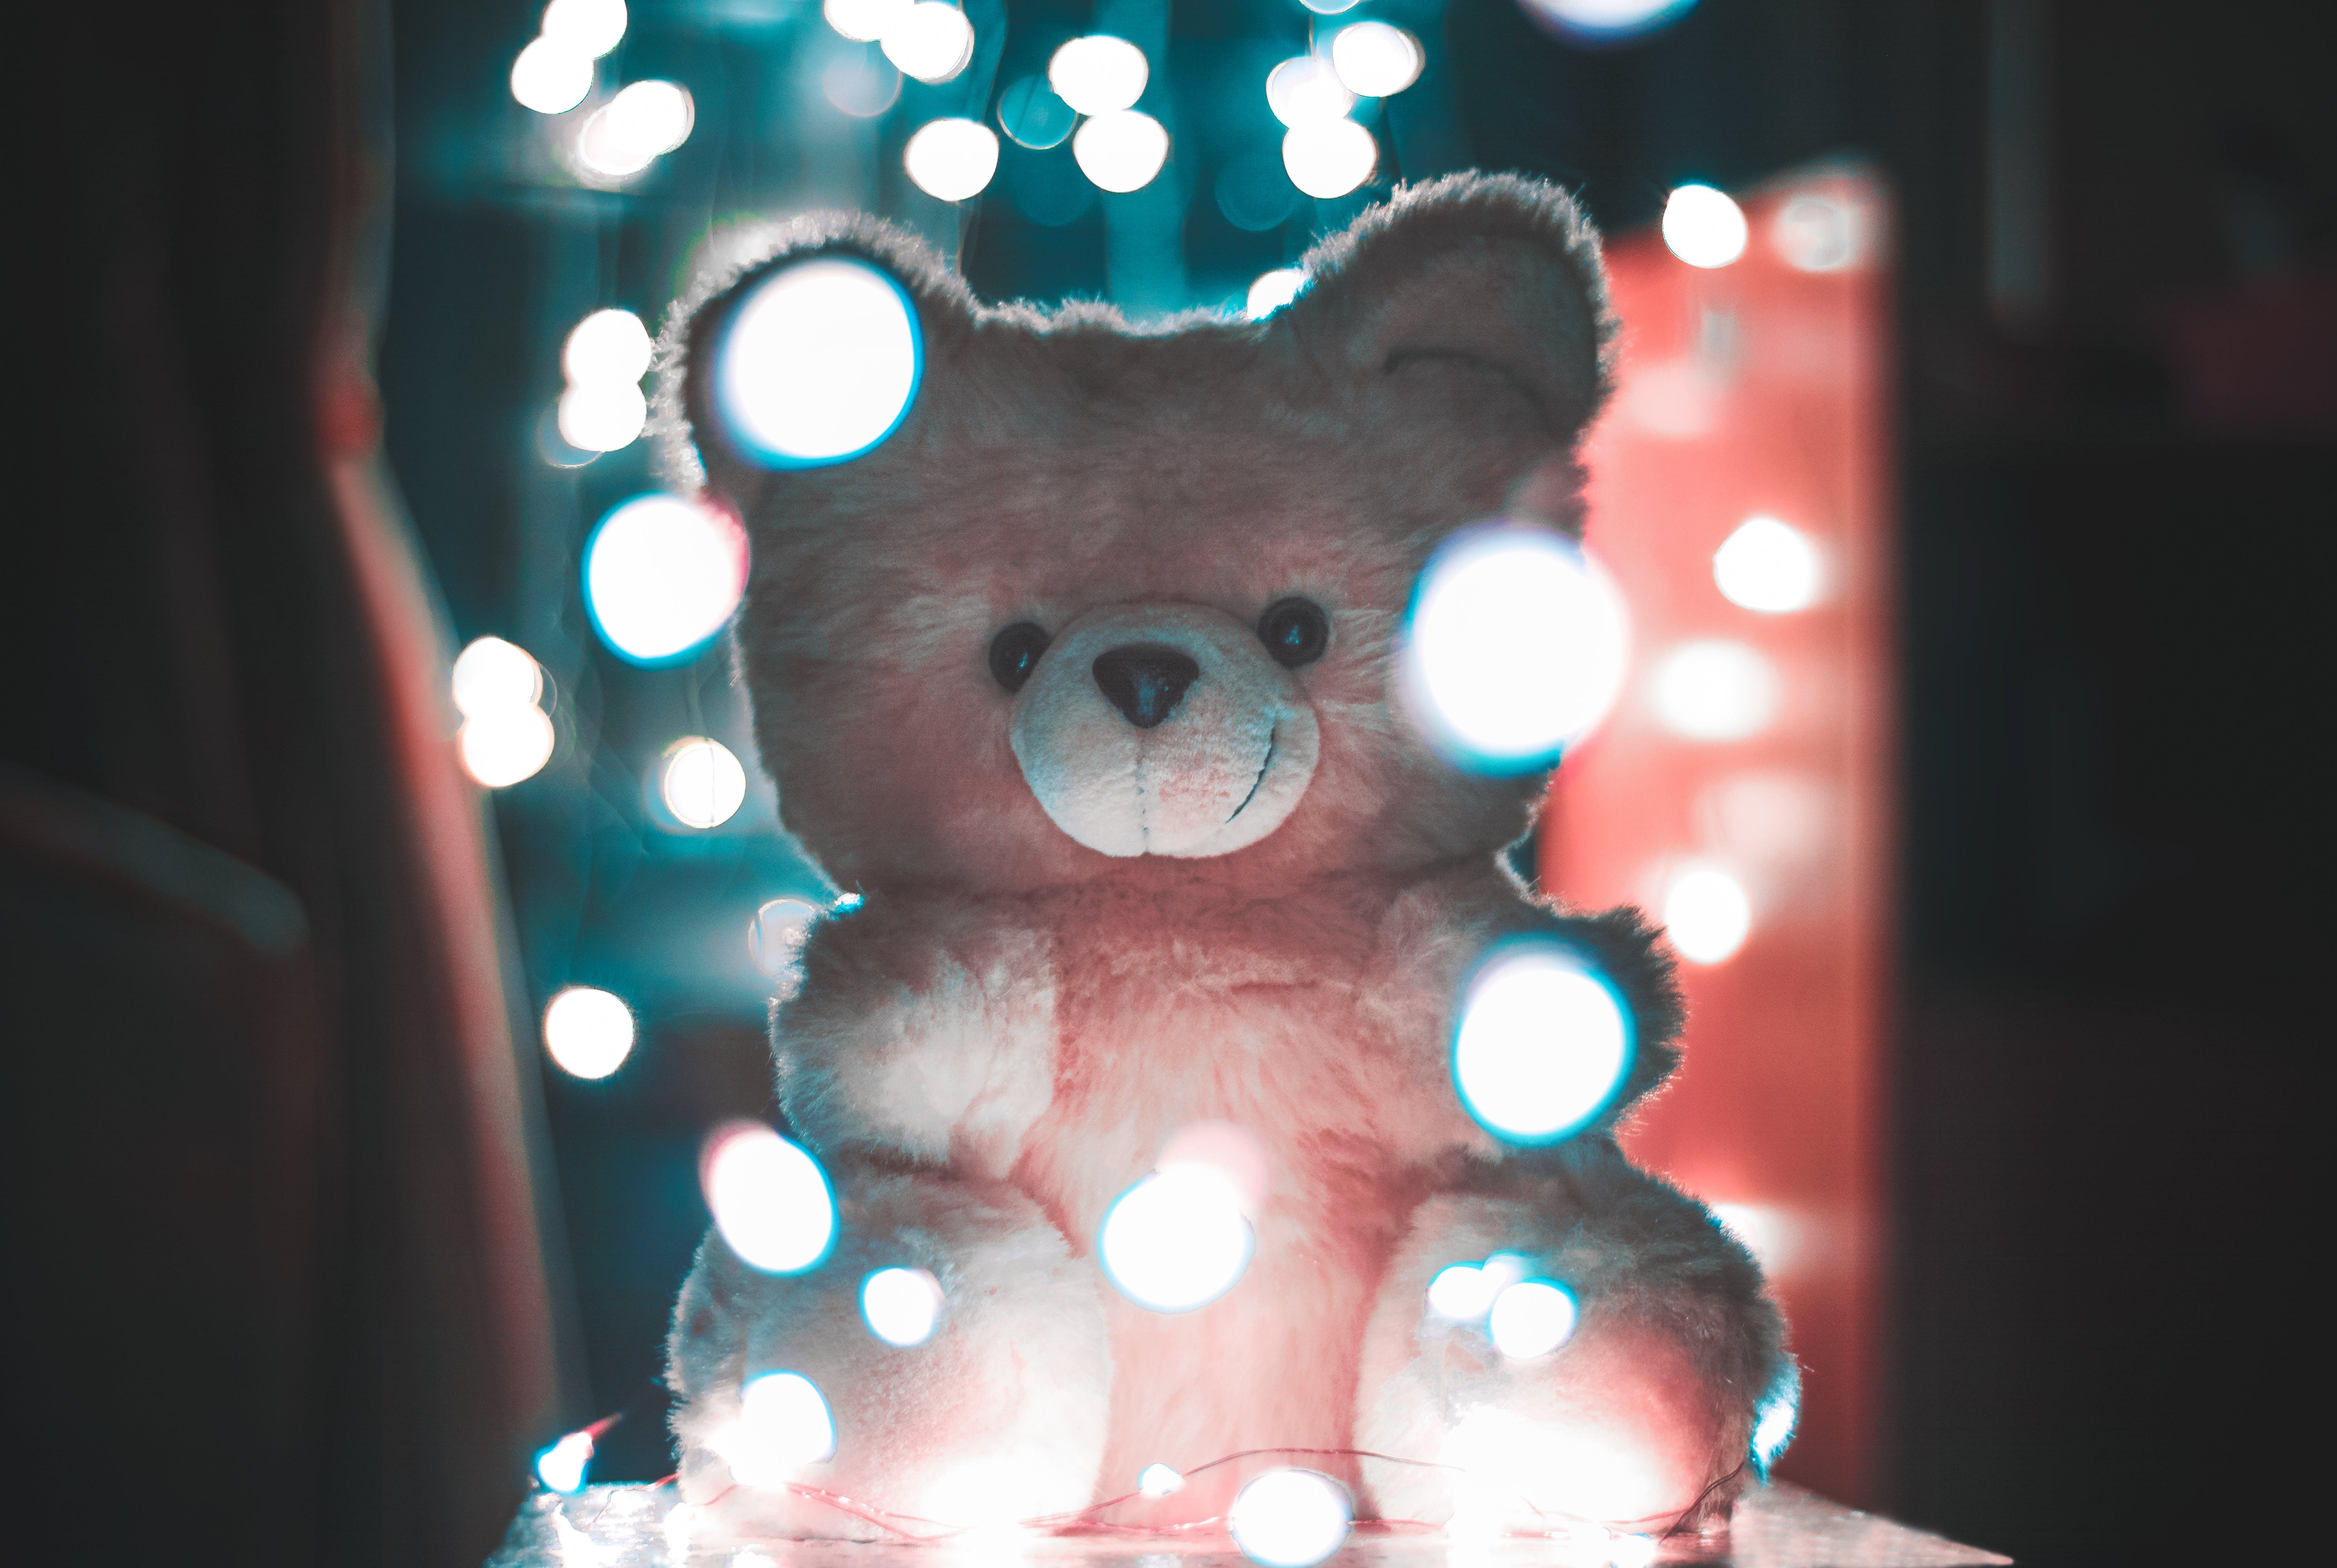 Bokeh Photography of Pink Bear Plush Toy